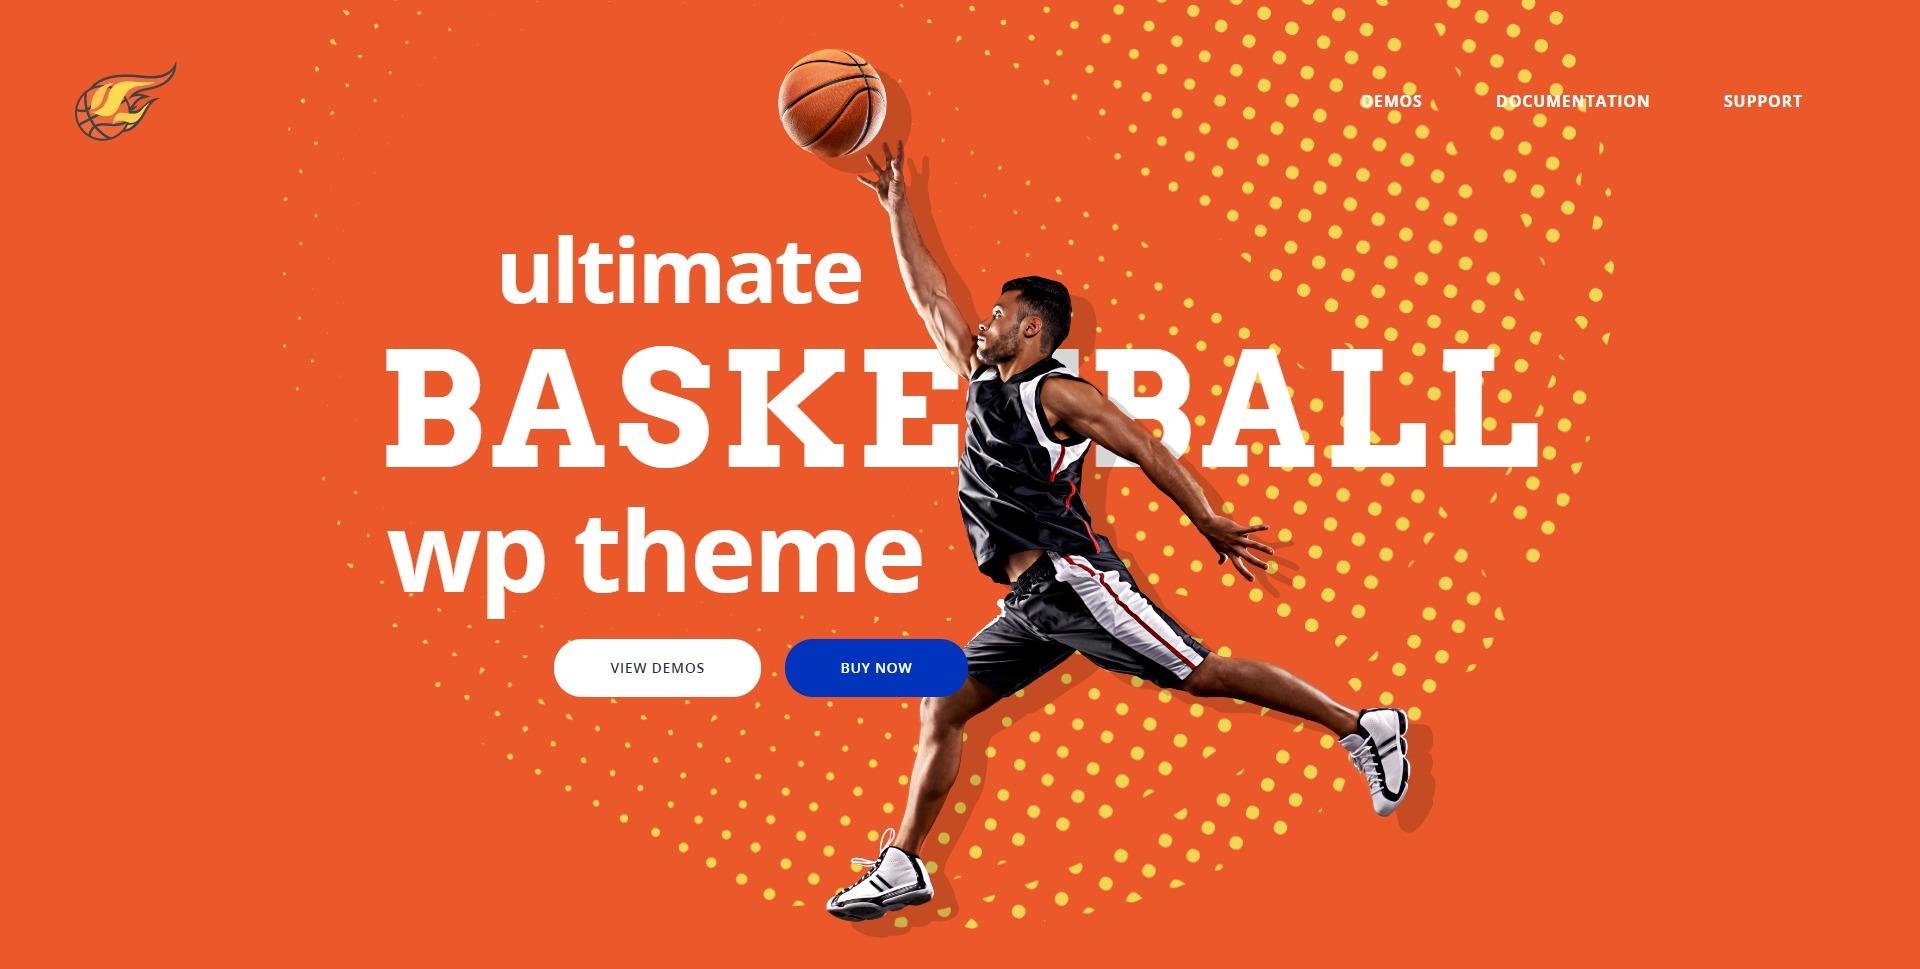 Tornados-篮球NBA运动衫在线商城WordPress主题